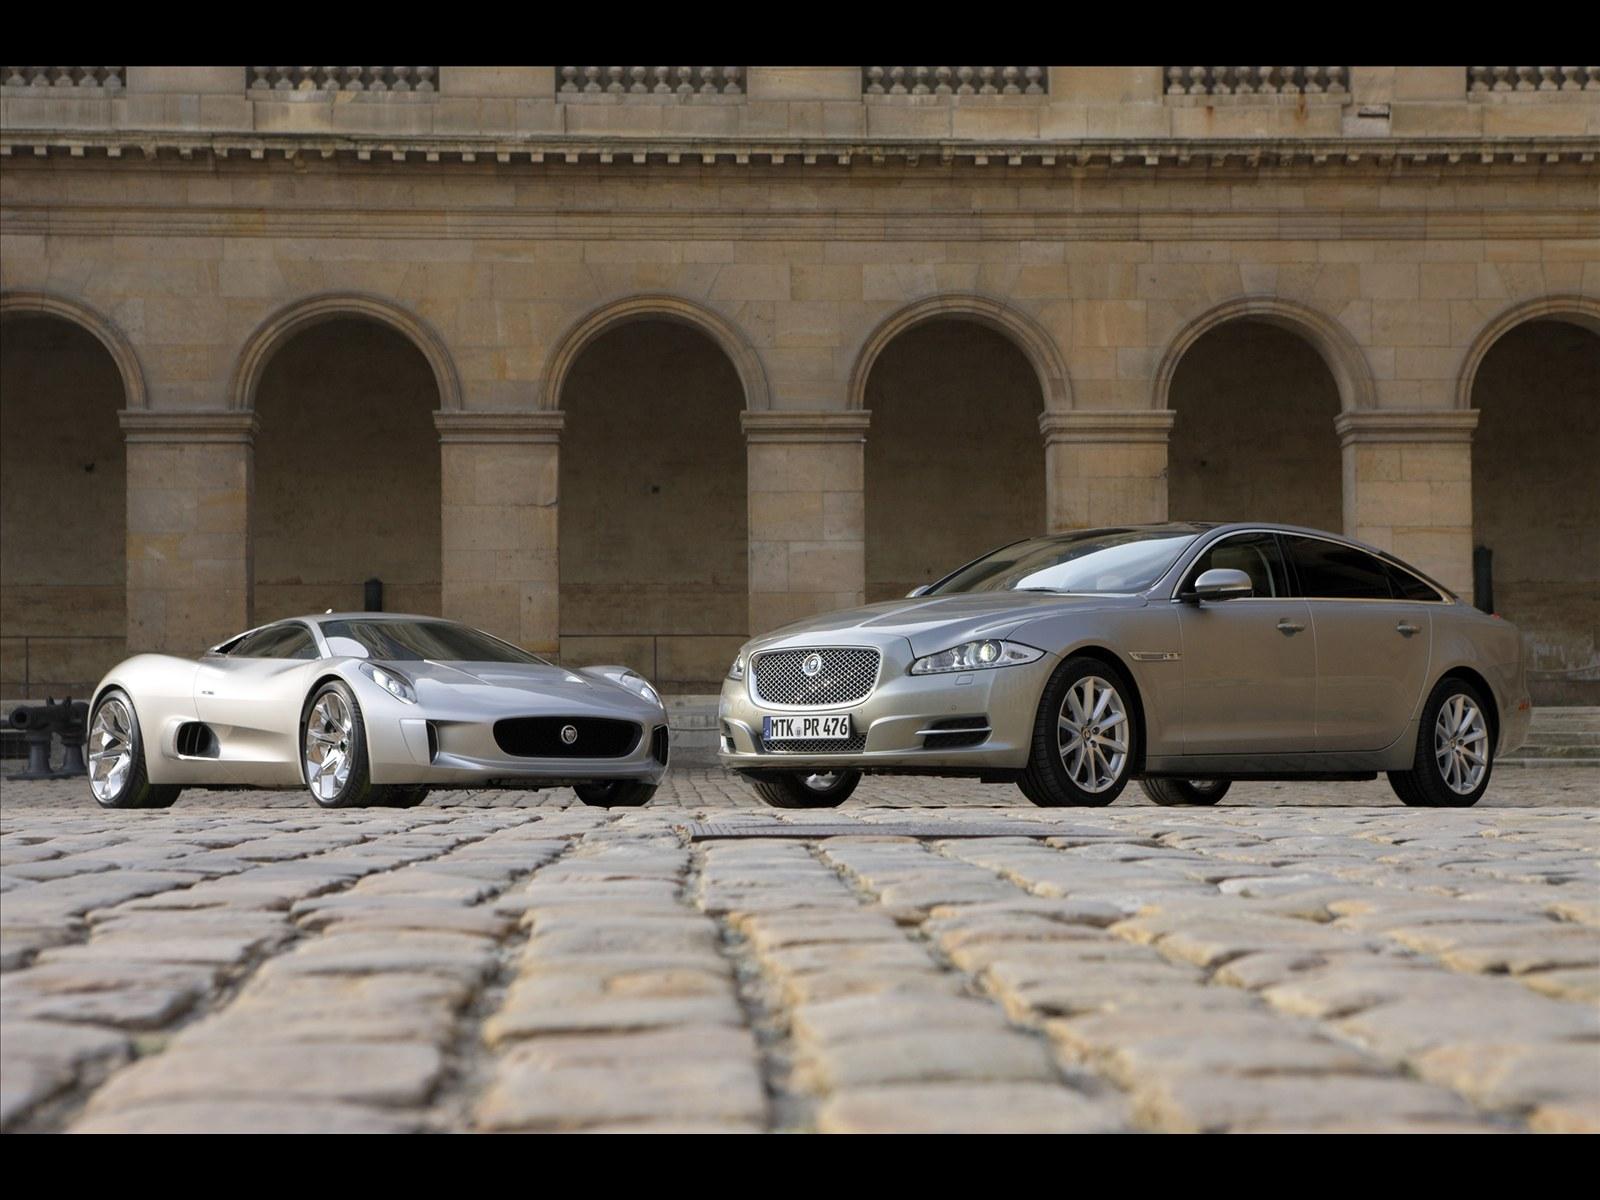 http://2.bp.blogspot.com/-xEmkTSFzSkM/TZorYWPn7HI/AAAAAAAABng/m-ZYEctKsX8/s1600/Jaguar+C-X75+2011+photo.jpg